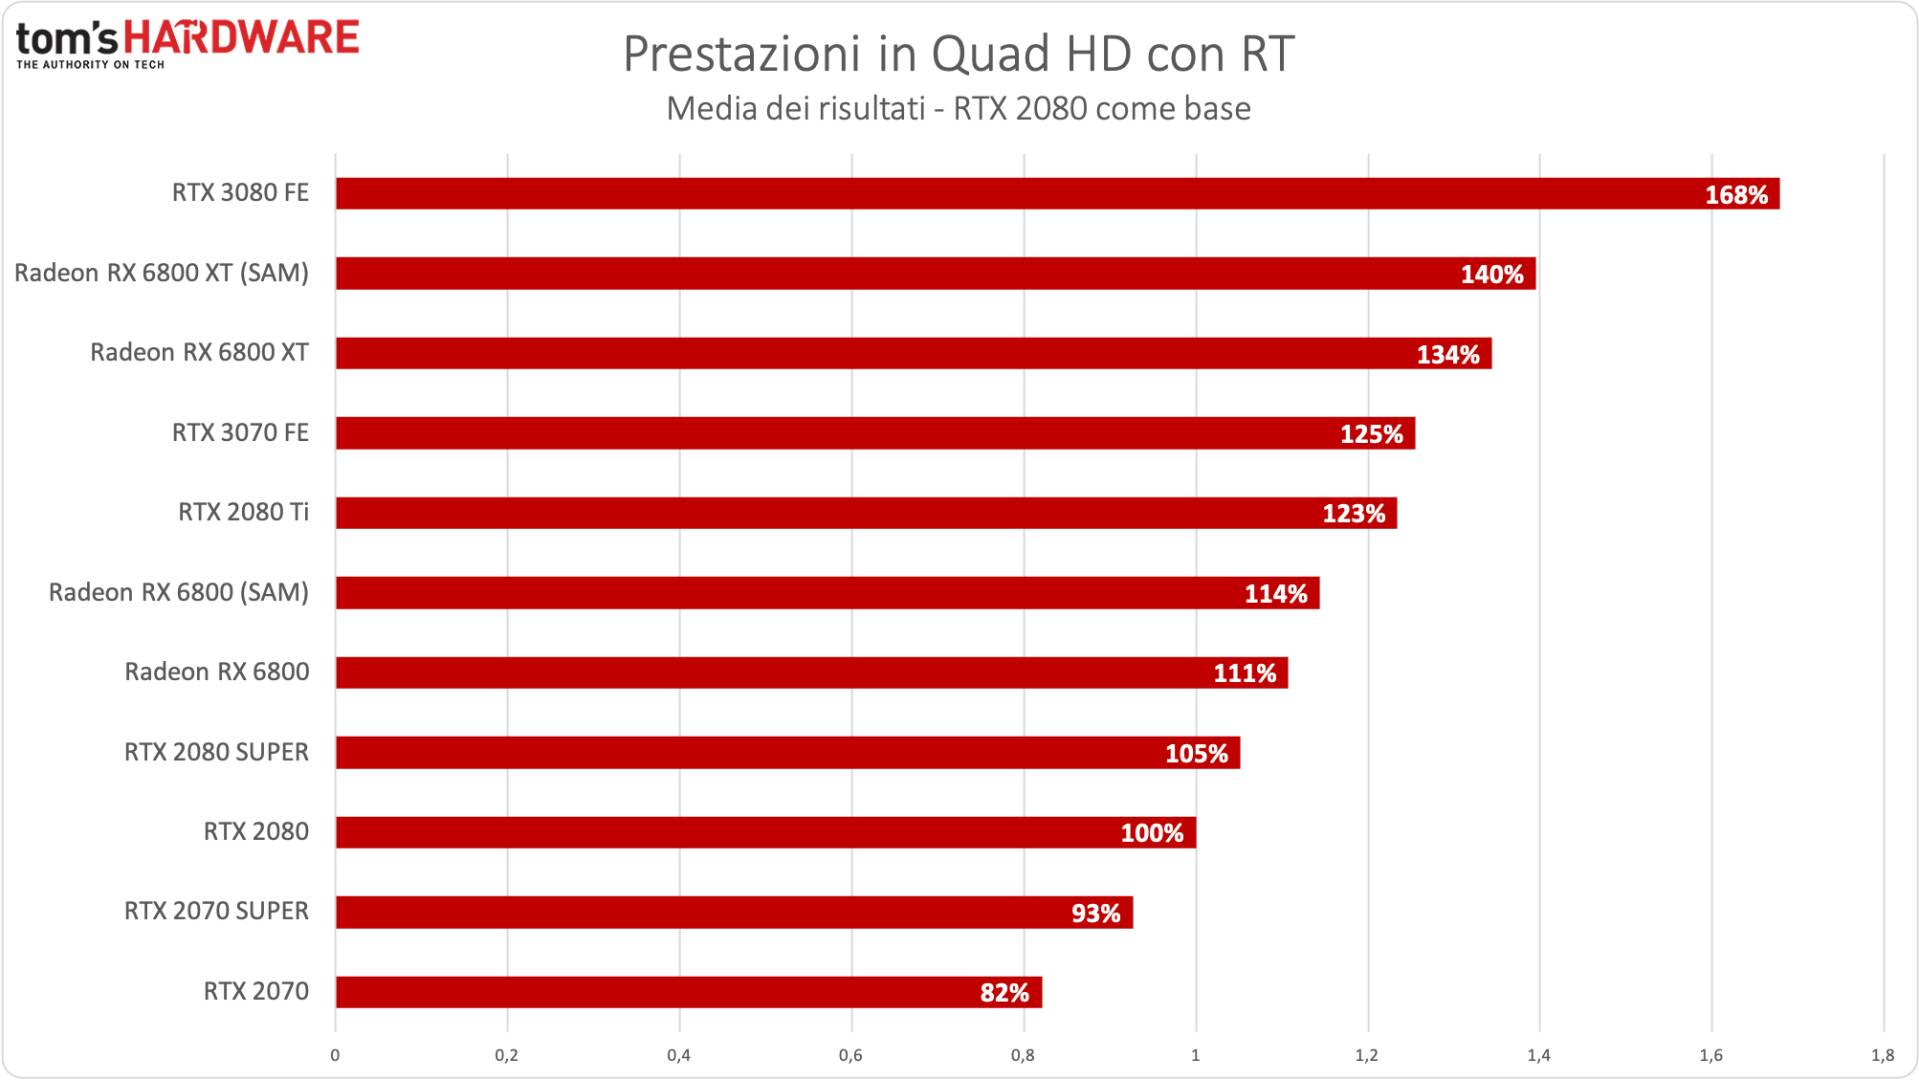 Benchmark Radeon RX 6800 XT / RX 6800 - QHD RTX - Incremento % RTX 2080